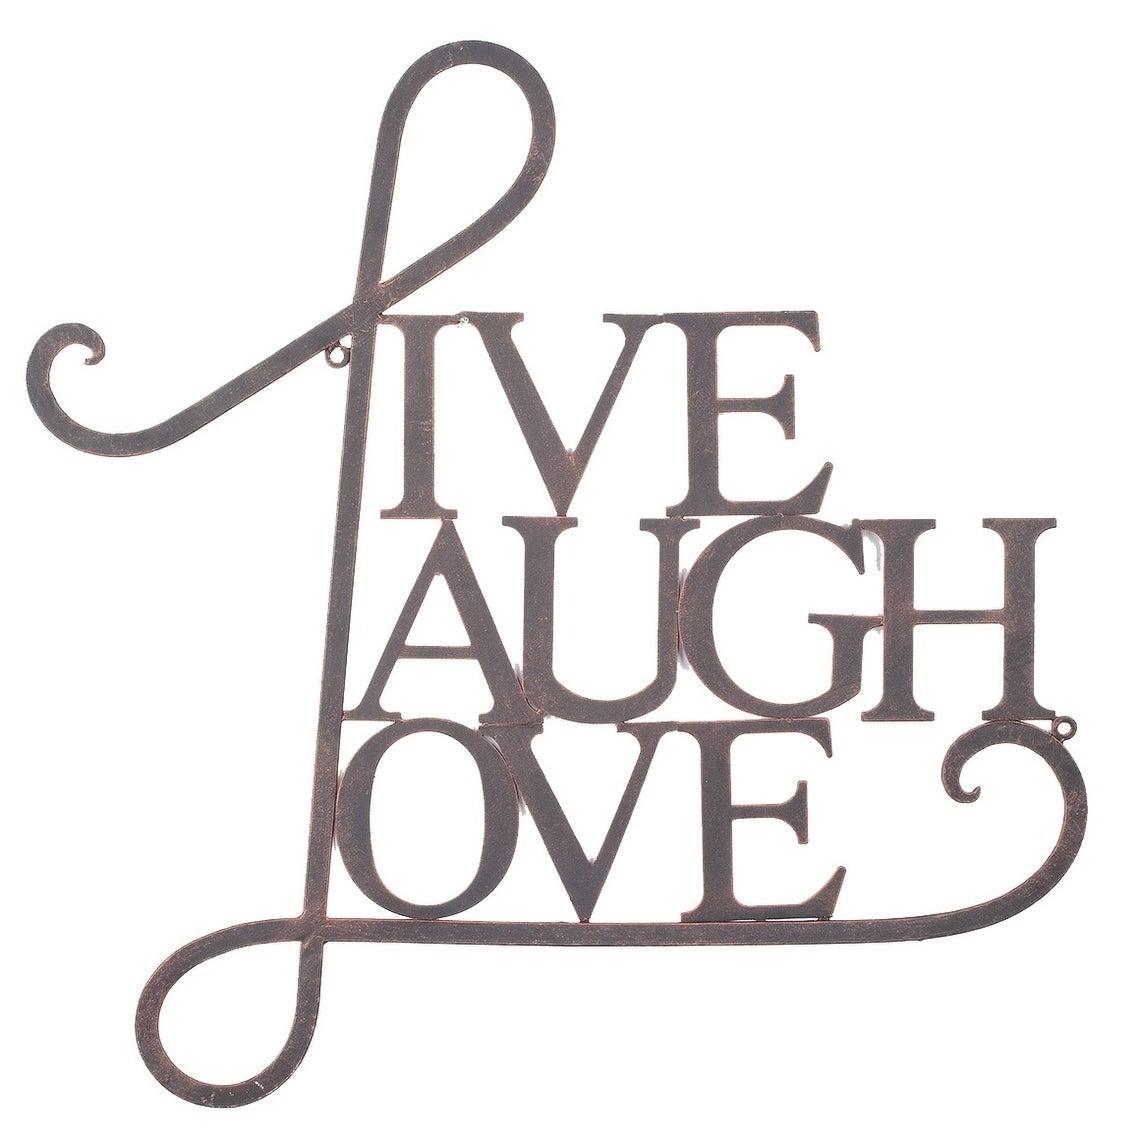 Live, Laugh, Love Wall Decor Antique Copper / White Finish Throughout Live, Laugh, Love Antique Copper Wall Decor (View 3 of 30)